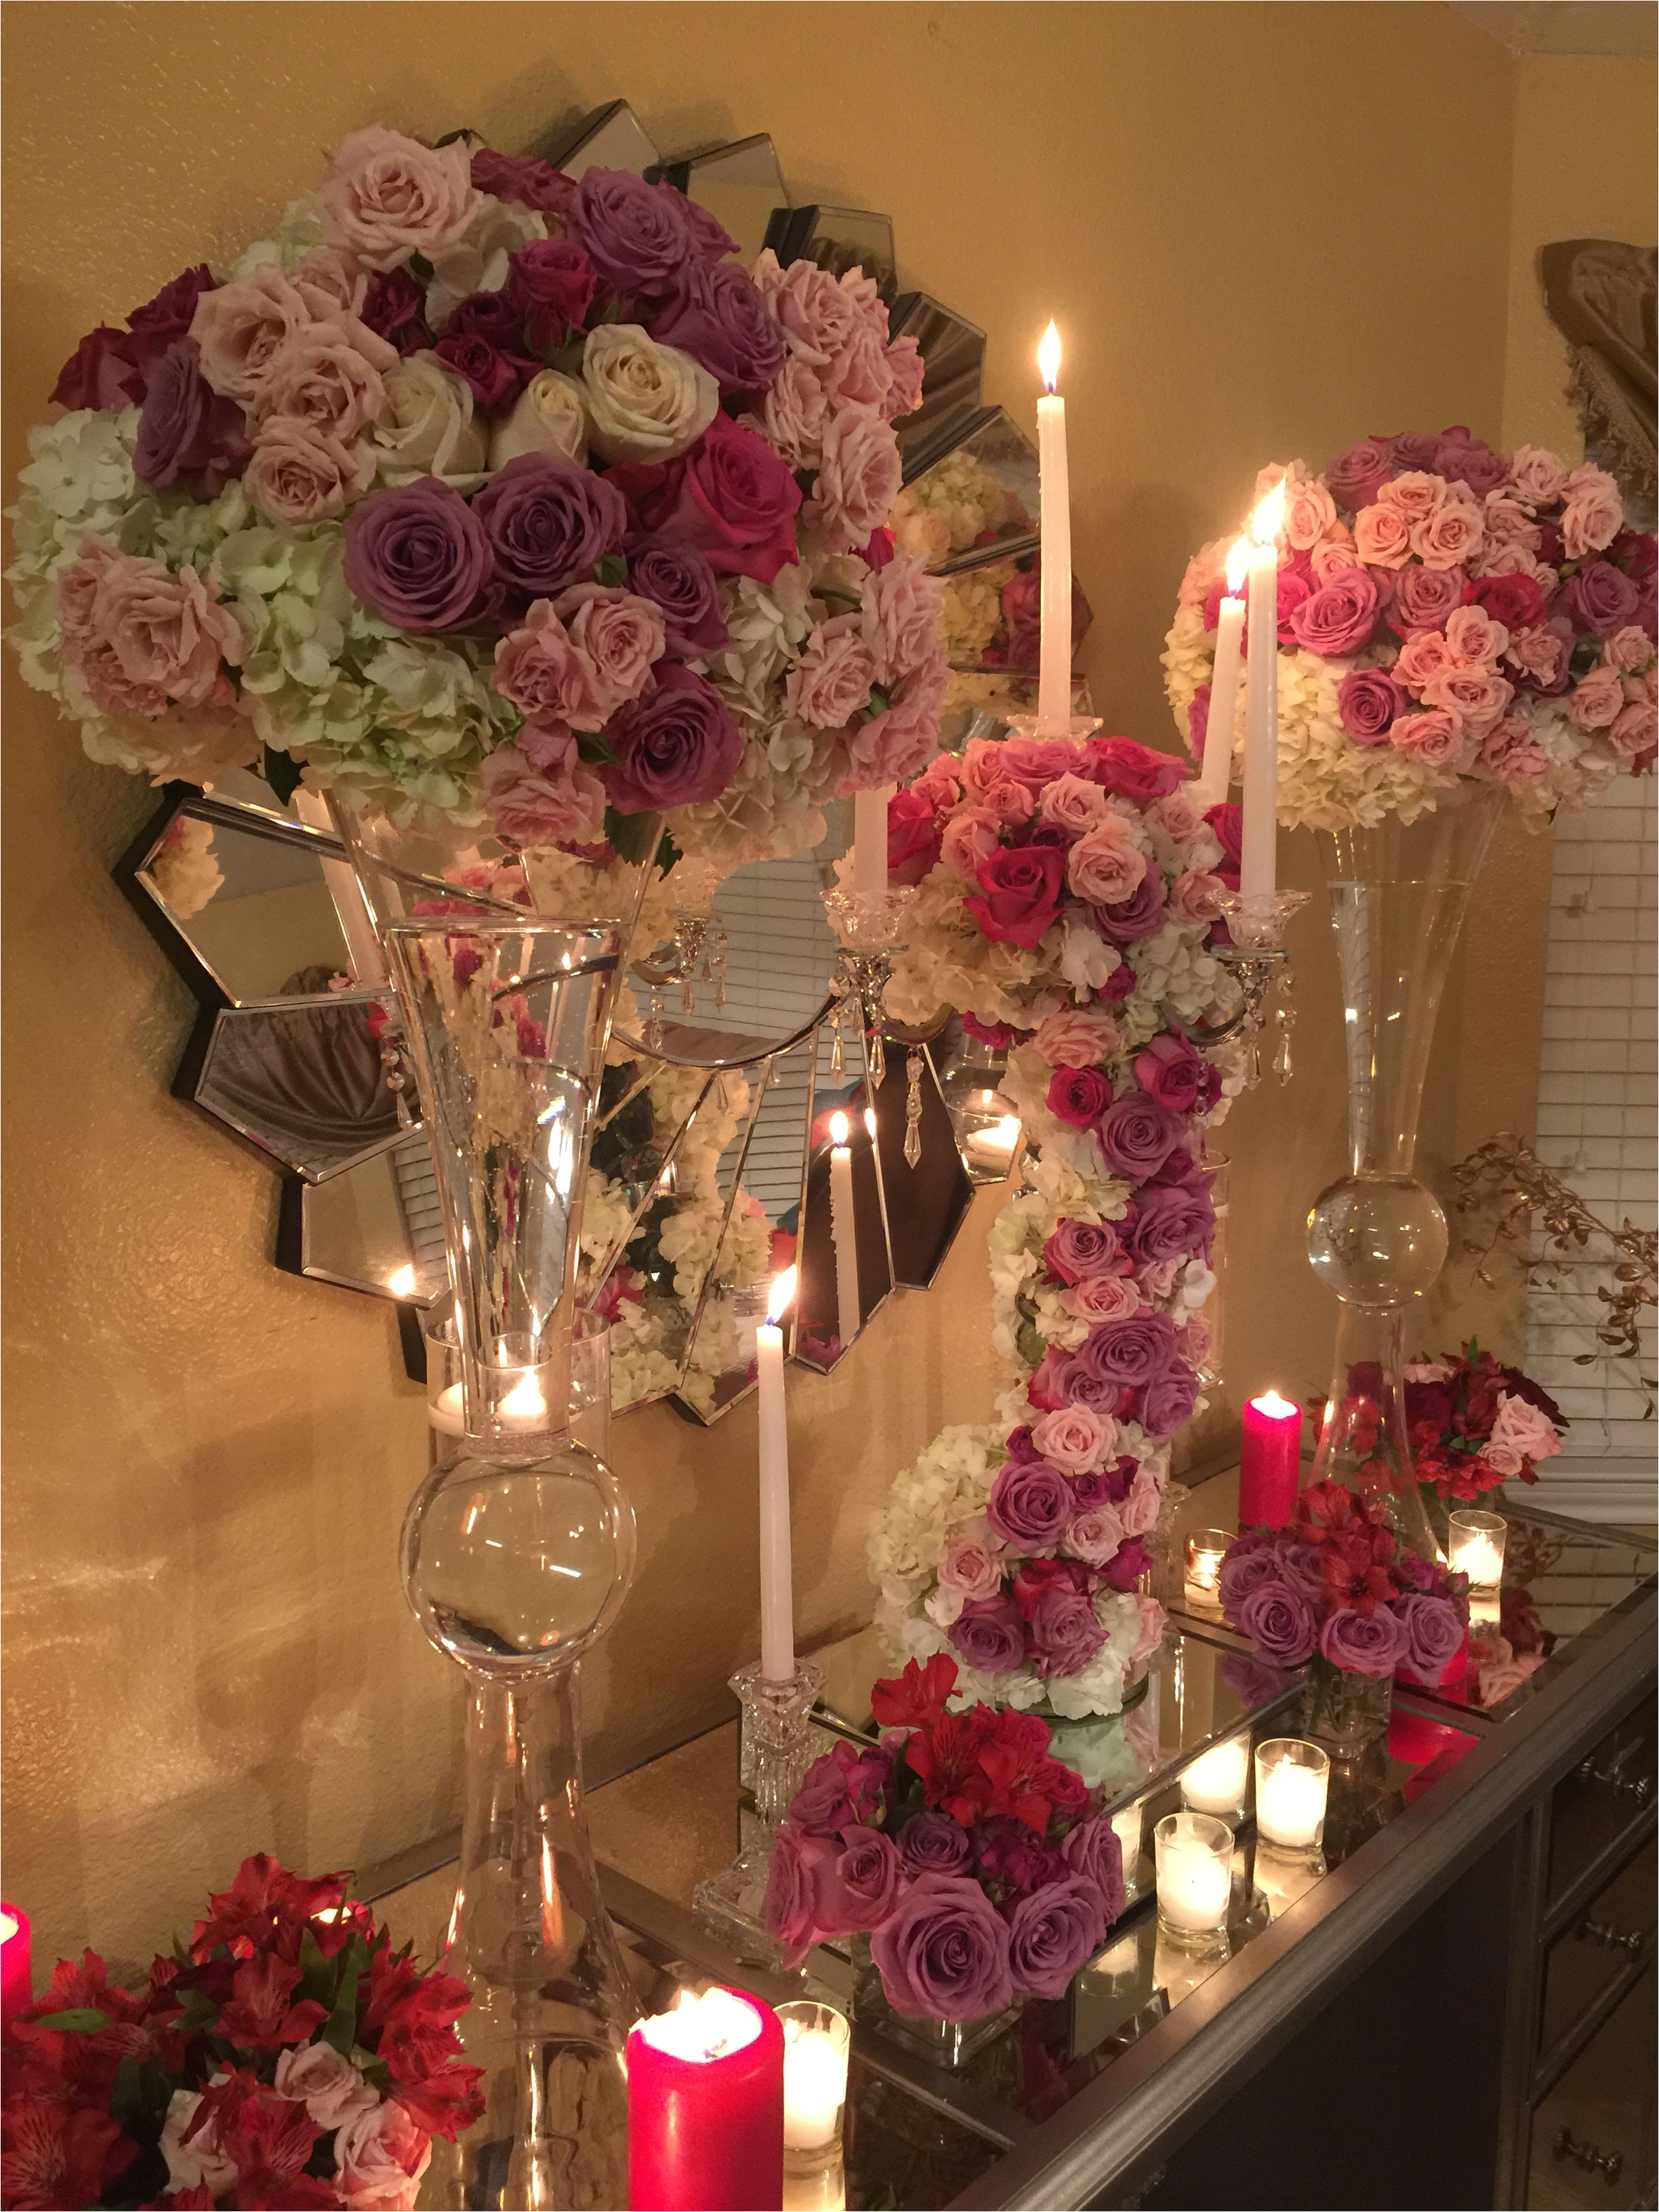 wedding table decorations wedding tables valentine decorations wedding centerpieces centrepieces flower